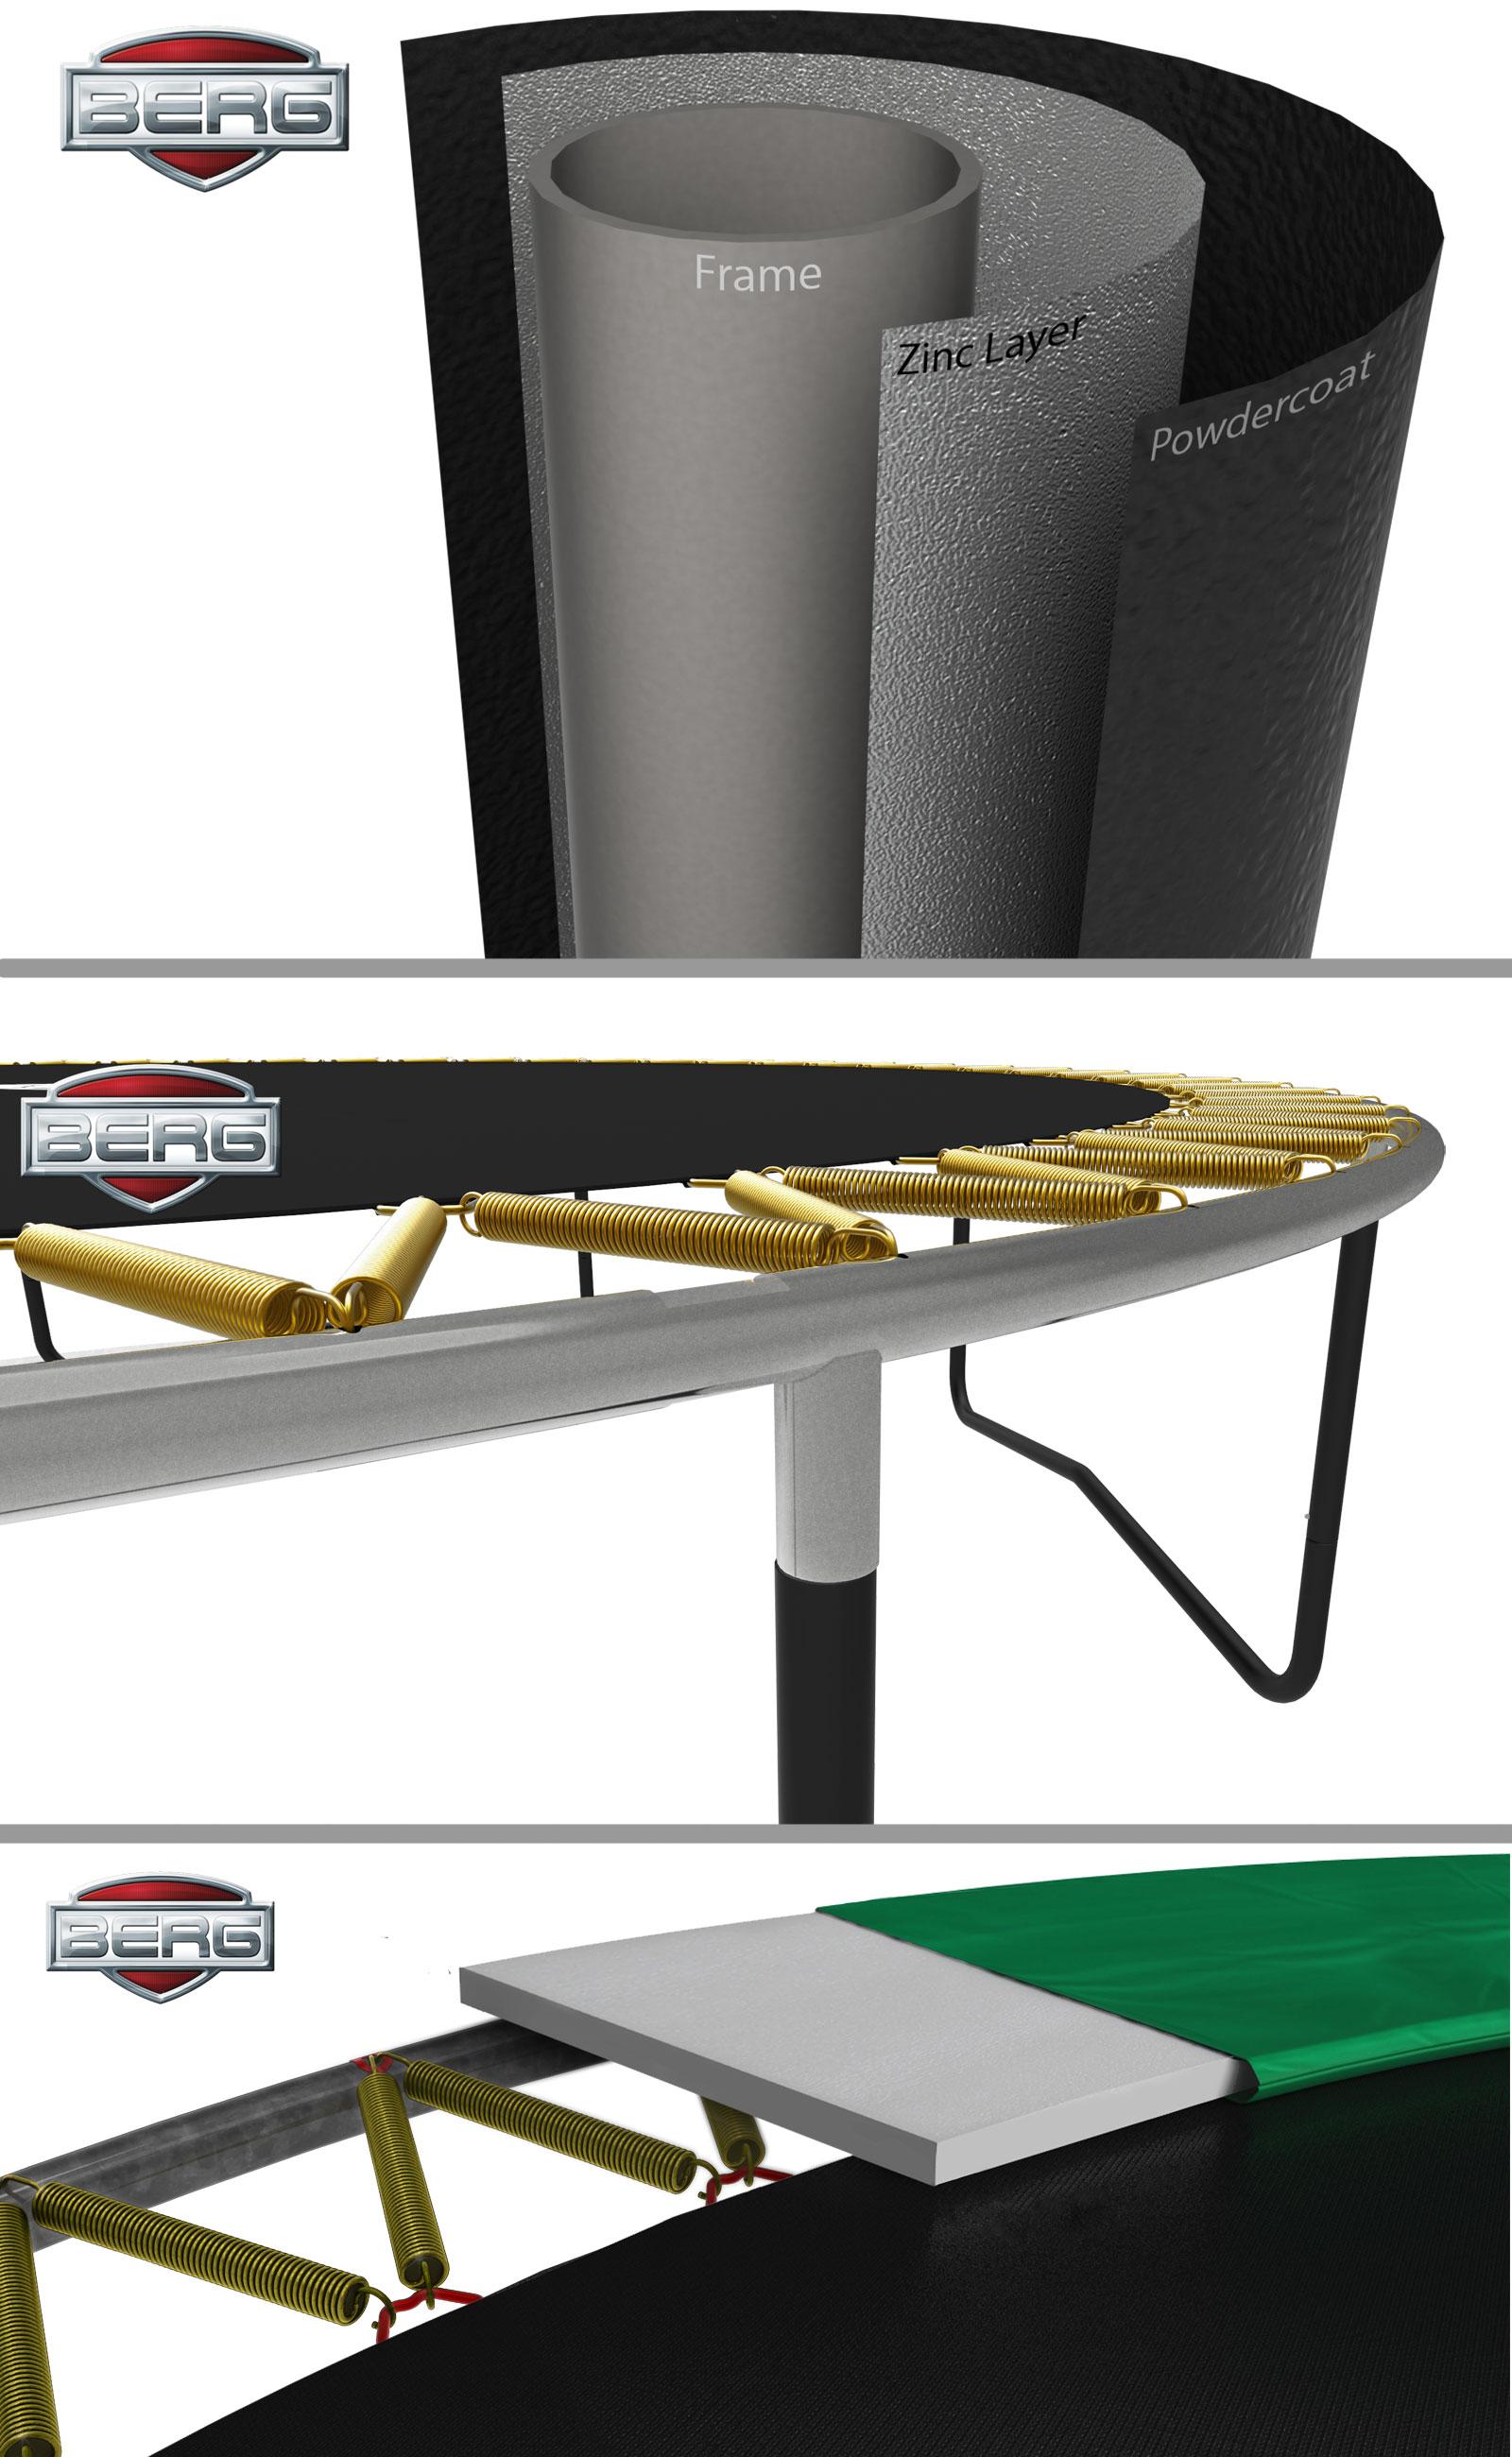 Trampolin Champion EazyFit grün + Netz Deluxe 330x220cm BERG toys Bild 3